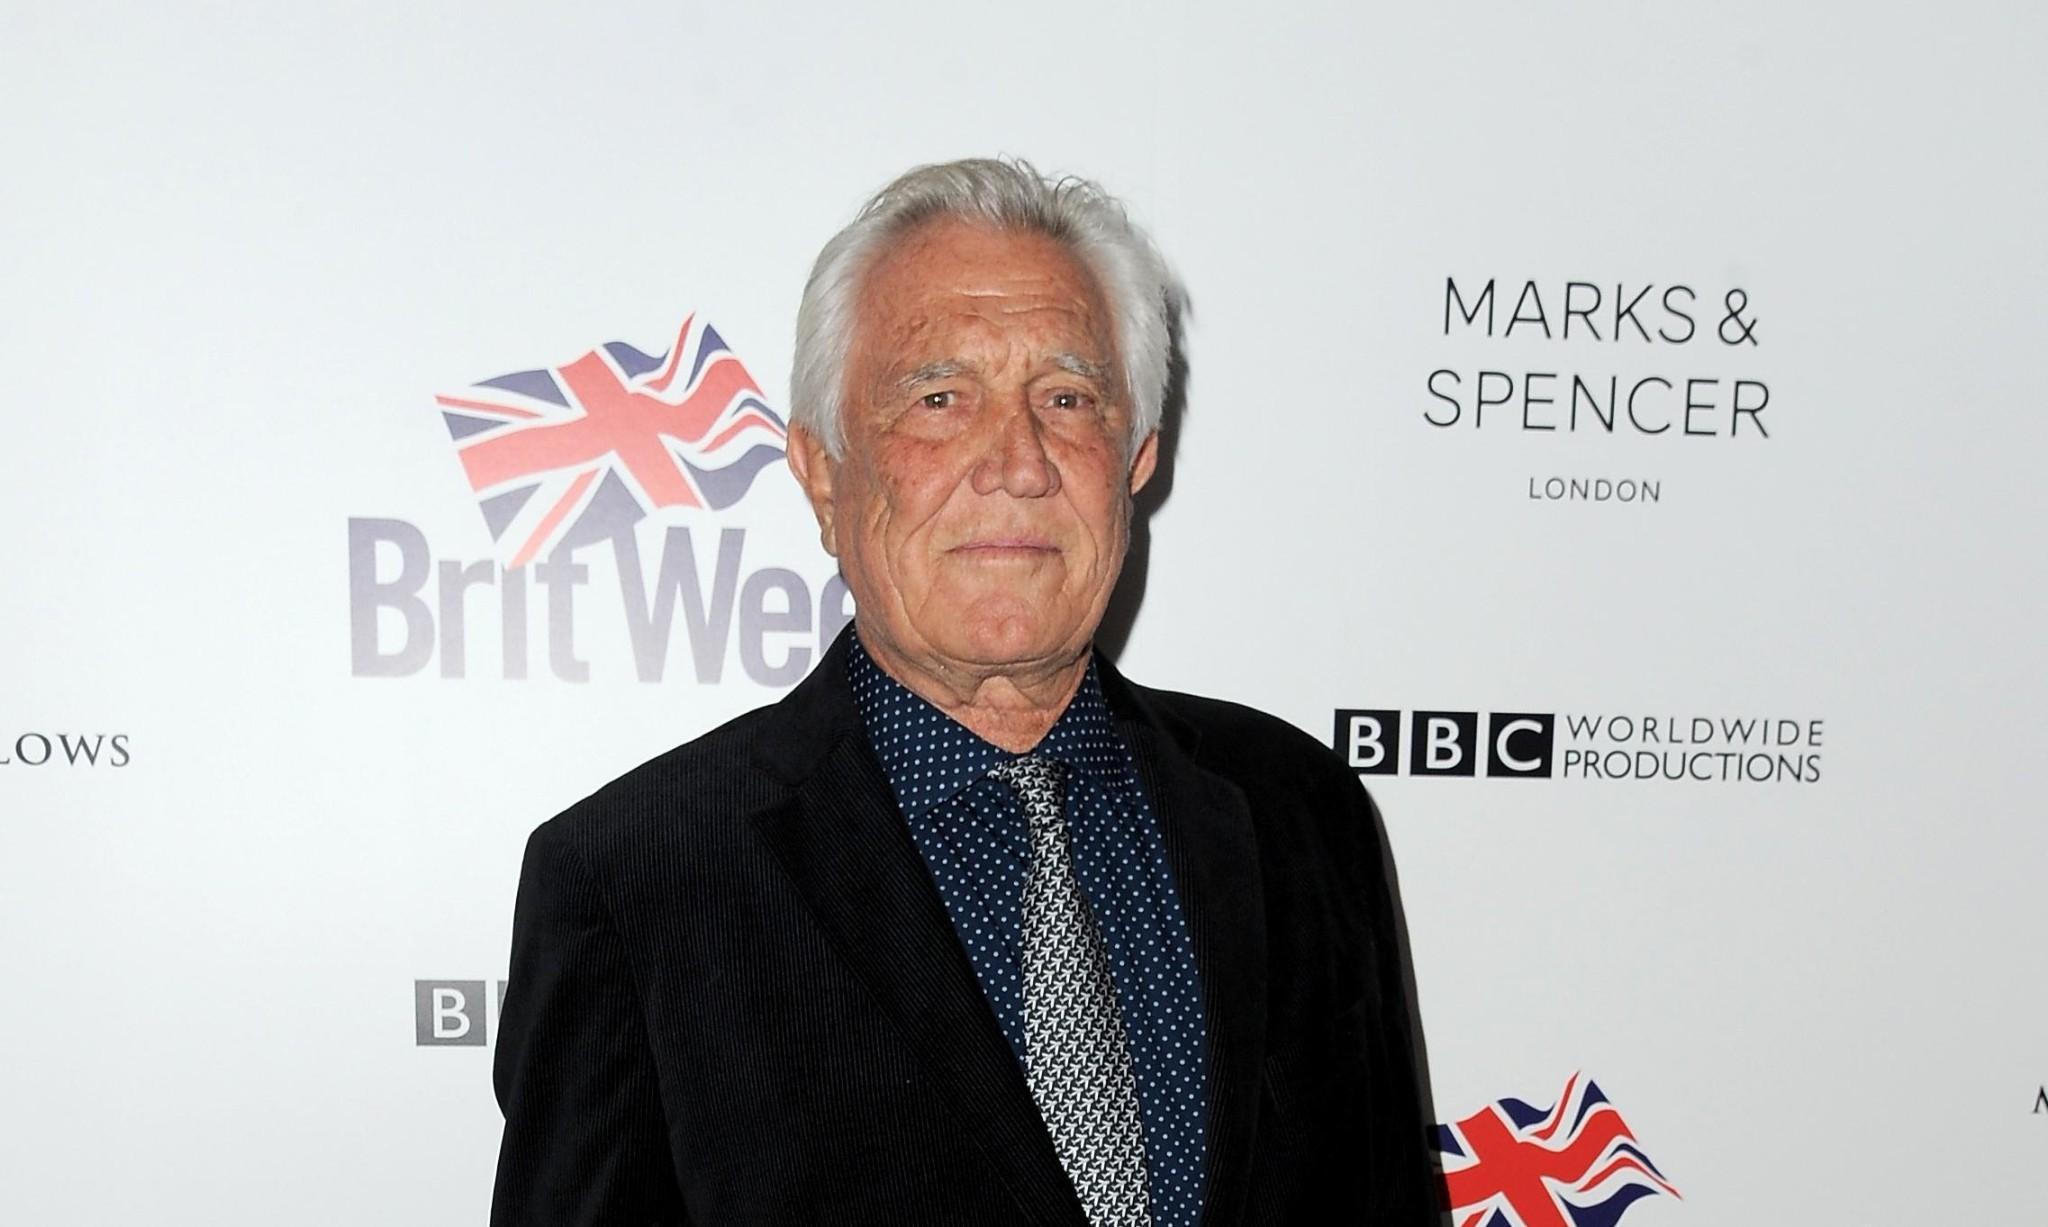 Former James Bond actor George Lazenby backs Idris Elba to play 007